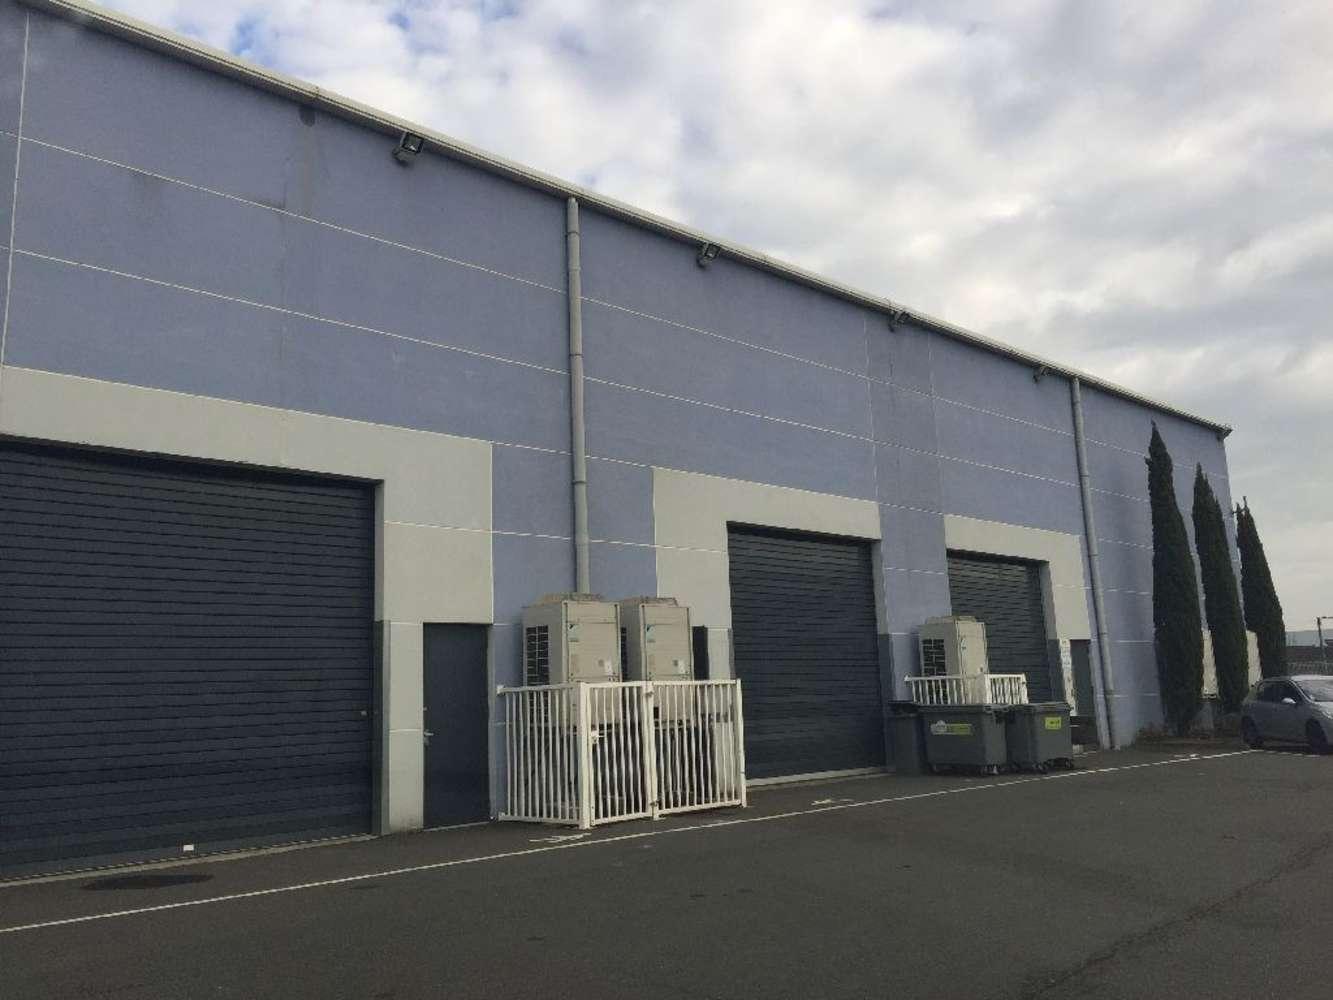 Activités/entrepôt Limonest, 69760 - Location bâtiment mixte TECHLID (Lyon) - 9837134